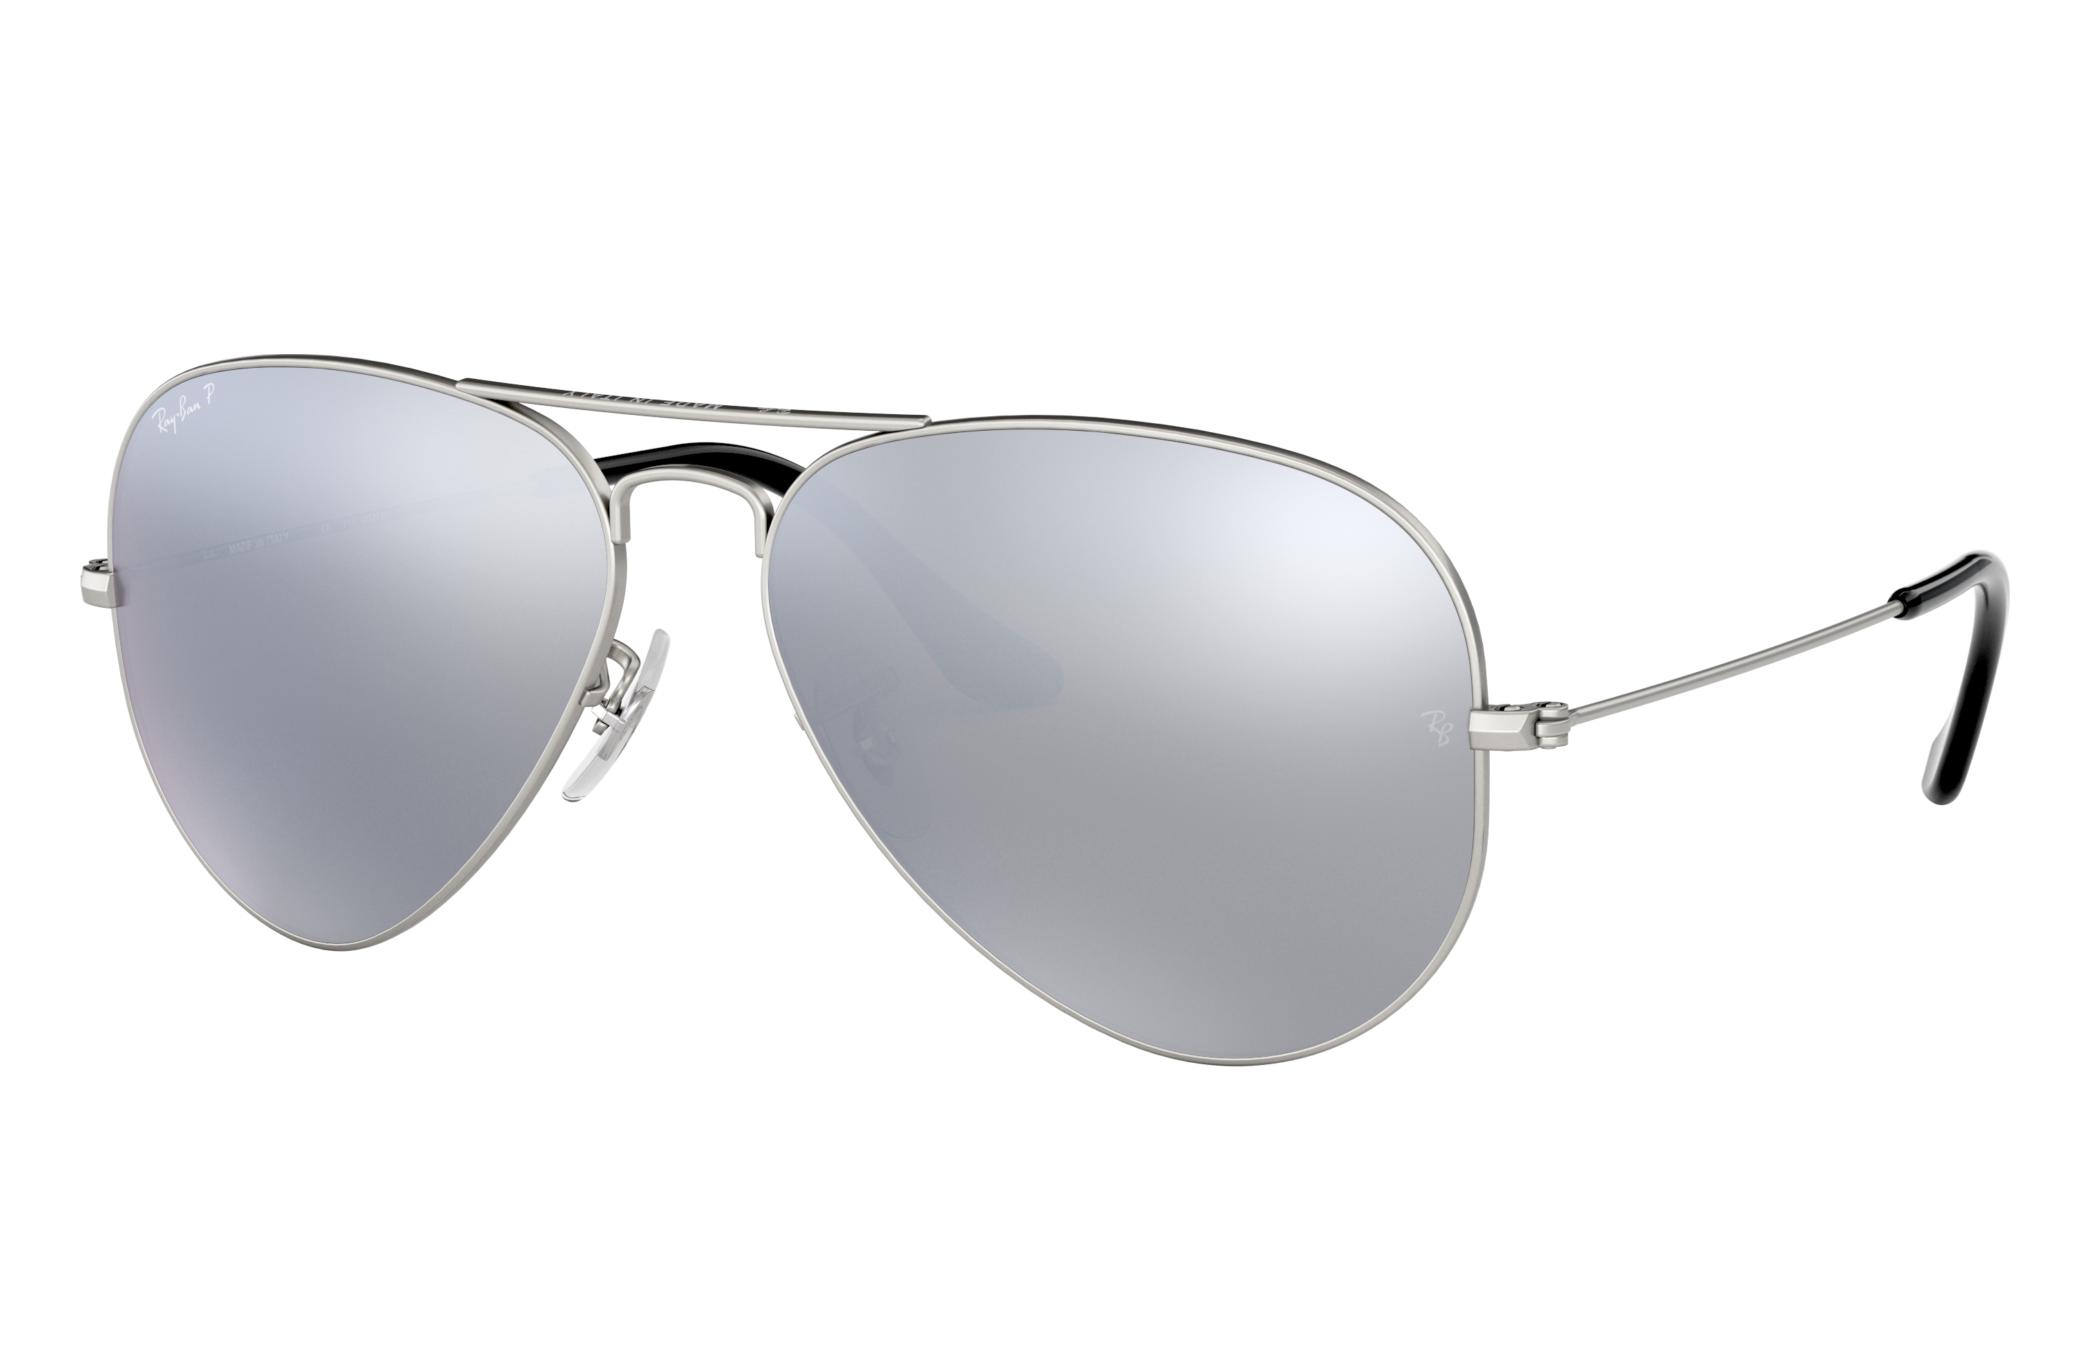 Ray-Ban Aviator Mirror Silver, Polarized Gray Lenses - RB3025